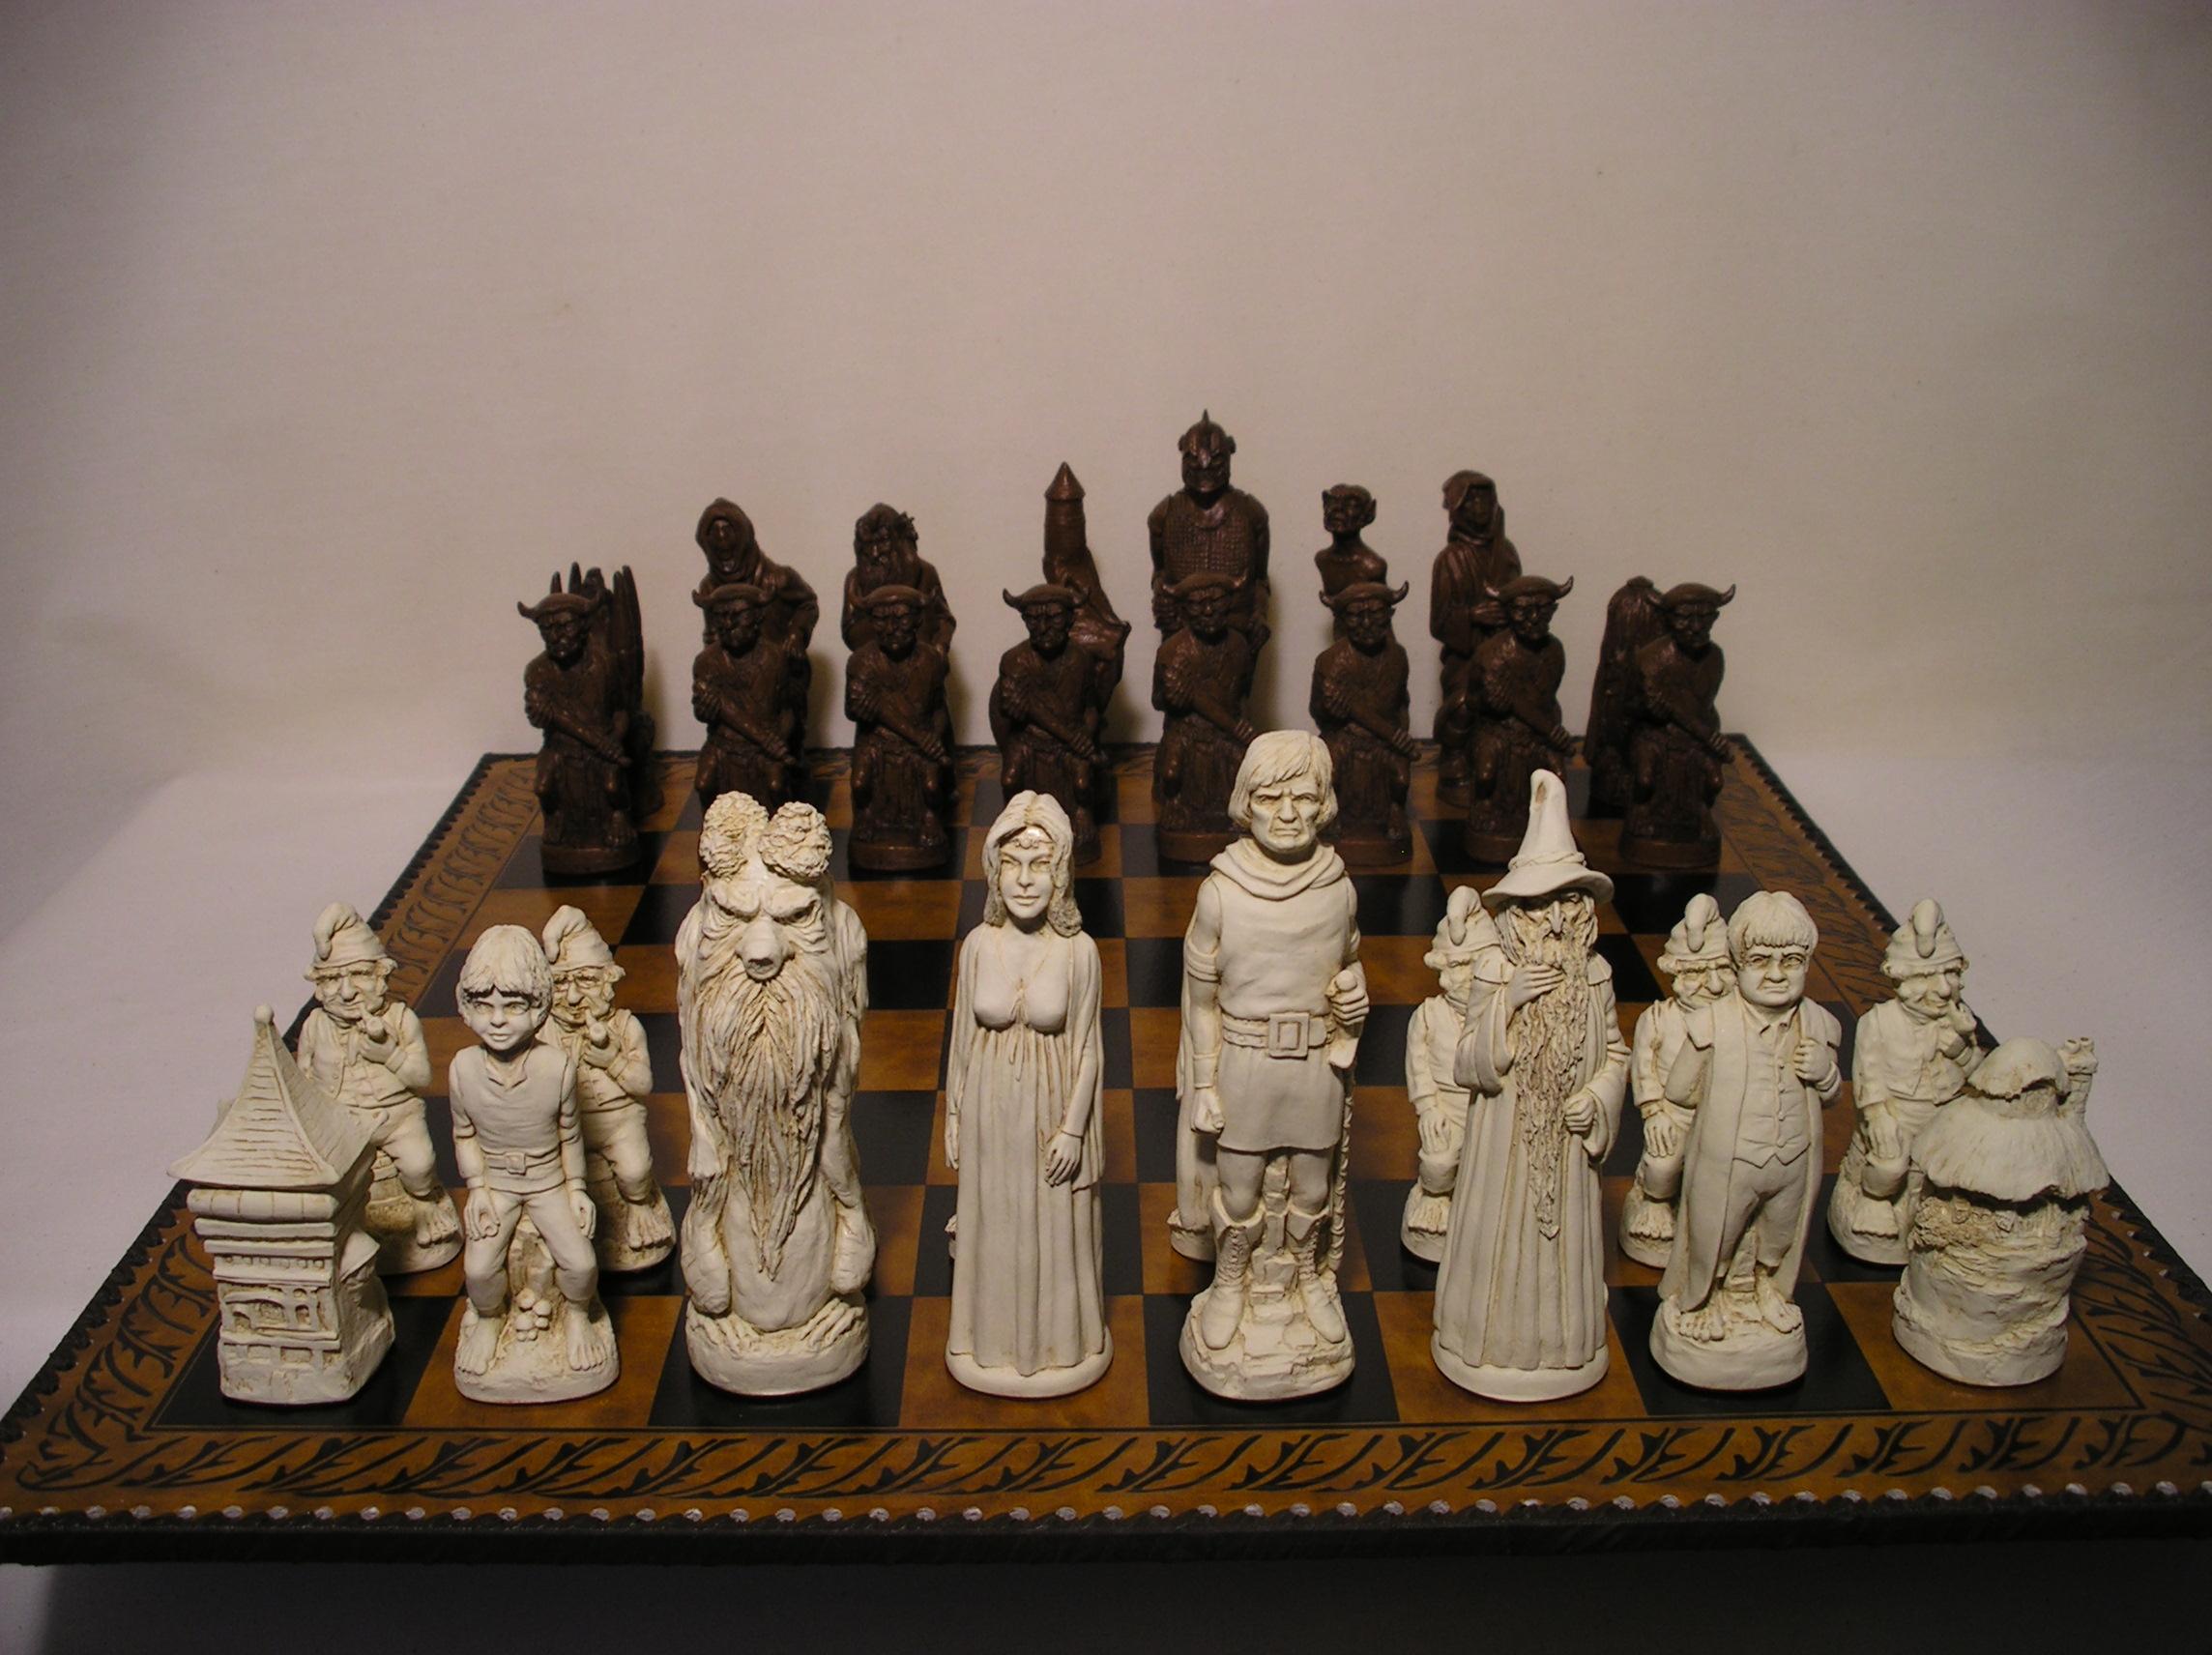 Lord Of The Rings Chess Set Mascott Direct Mascott Direct